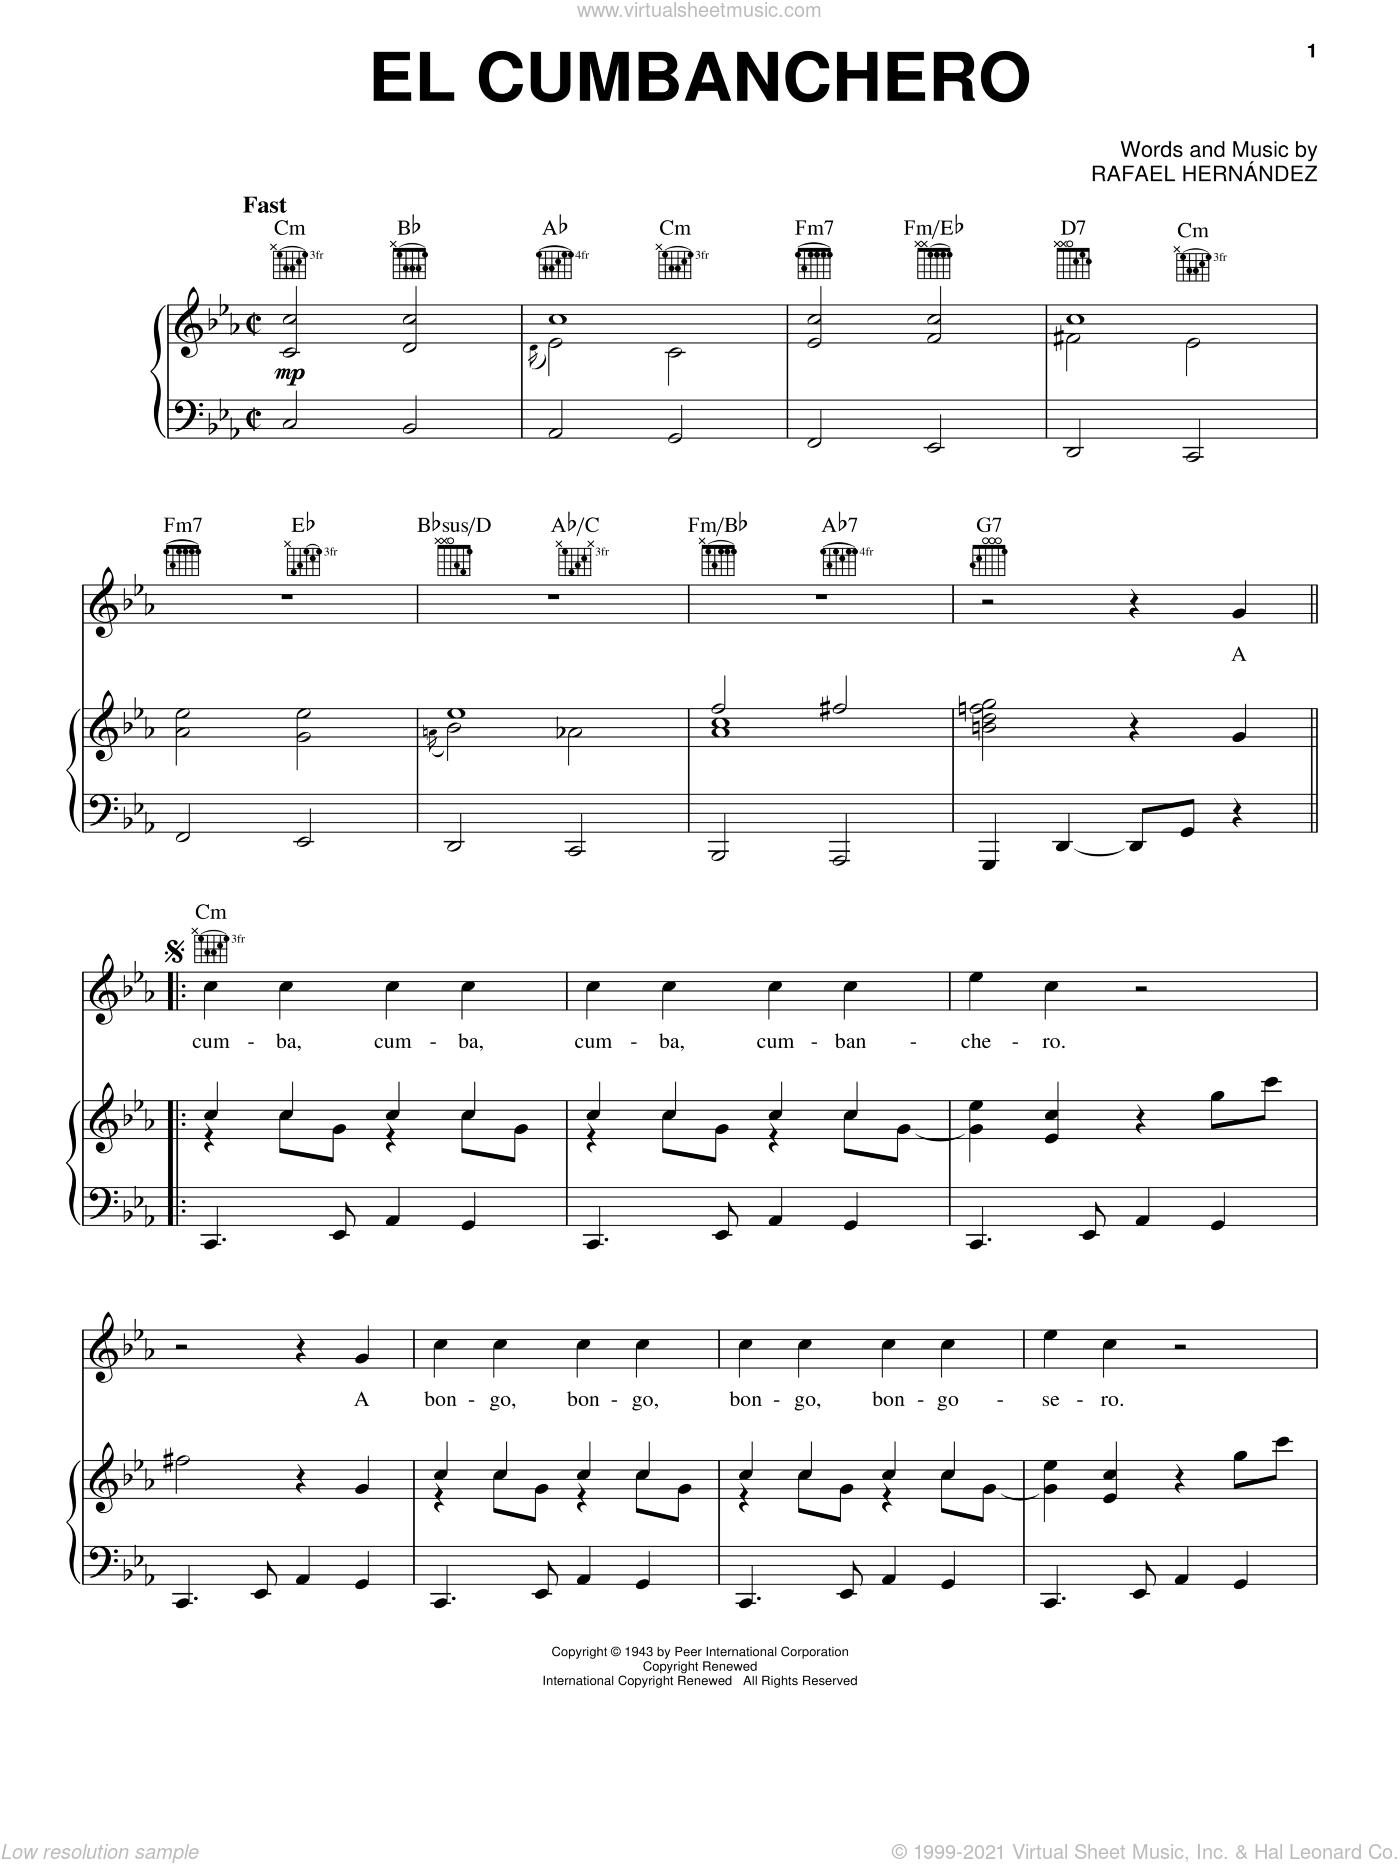 El Cumbanchero sheet music for voice, piano or guitar by Rafael Hernandez, intermediate skill level